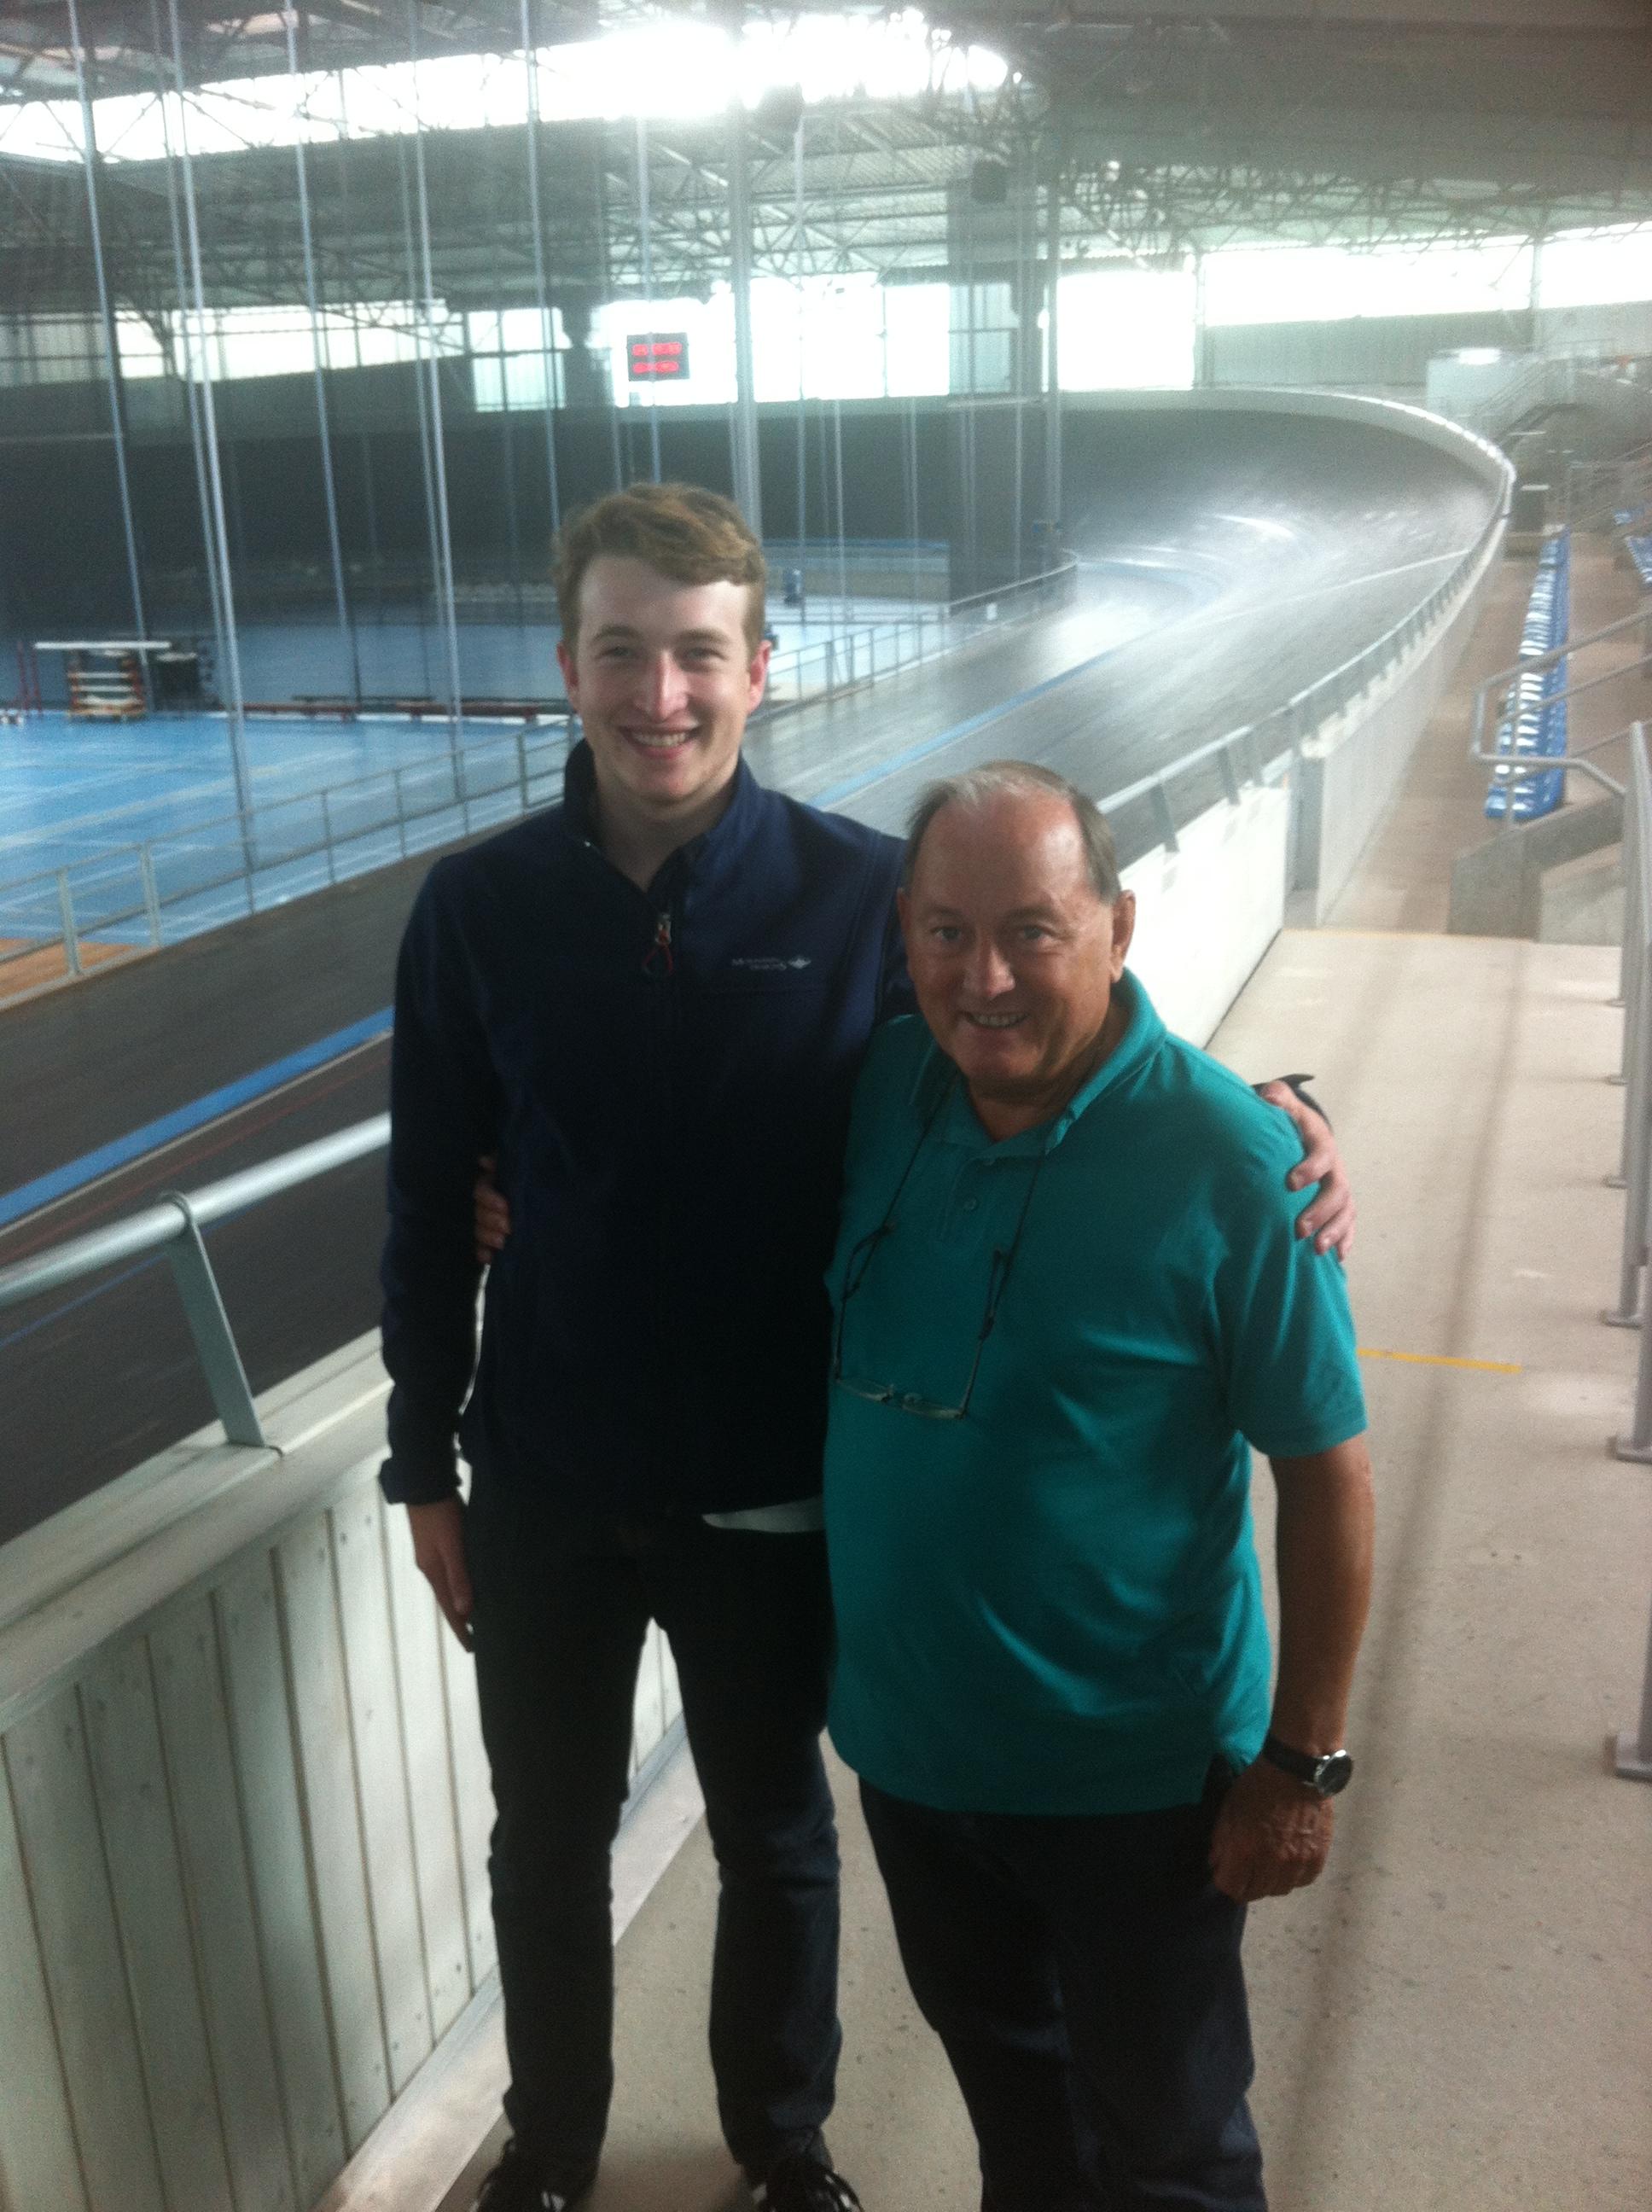 Inside the Eddy Merckx Velodrome in Ghent